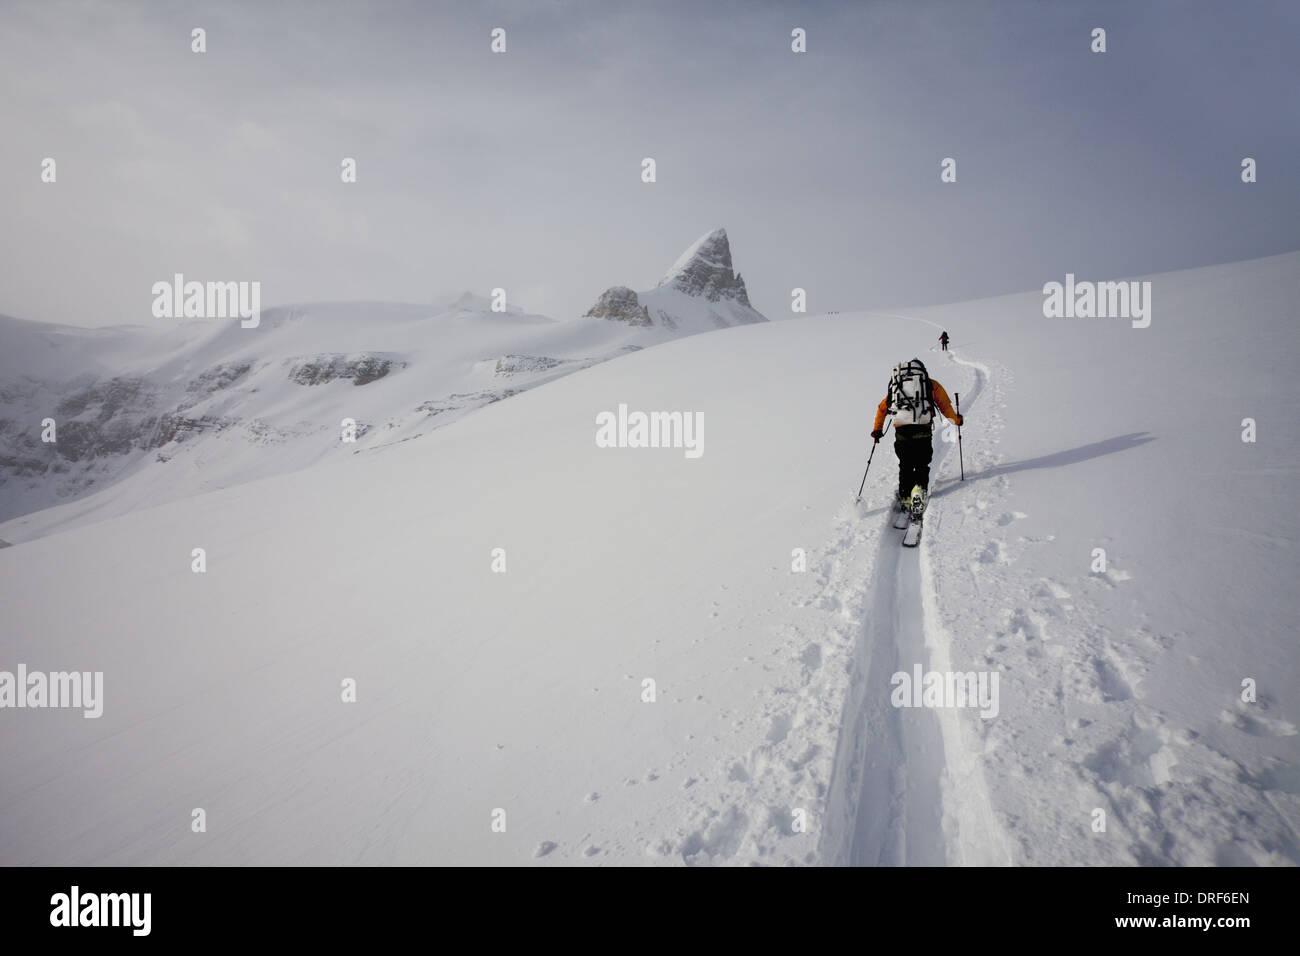 Alberta Canada. Two skiers ascending ridge in mist and cloud Wapta Traverse - Stock Image